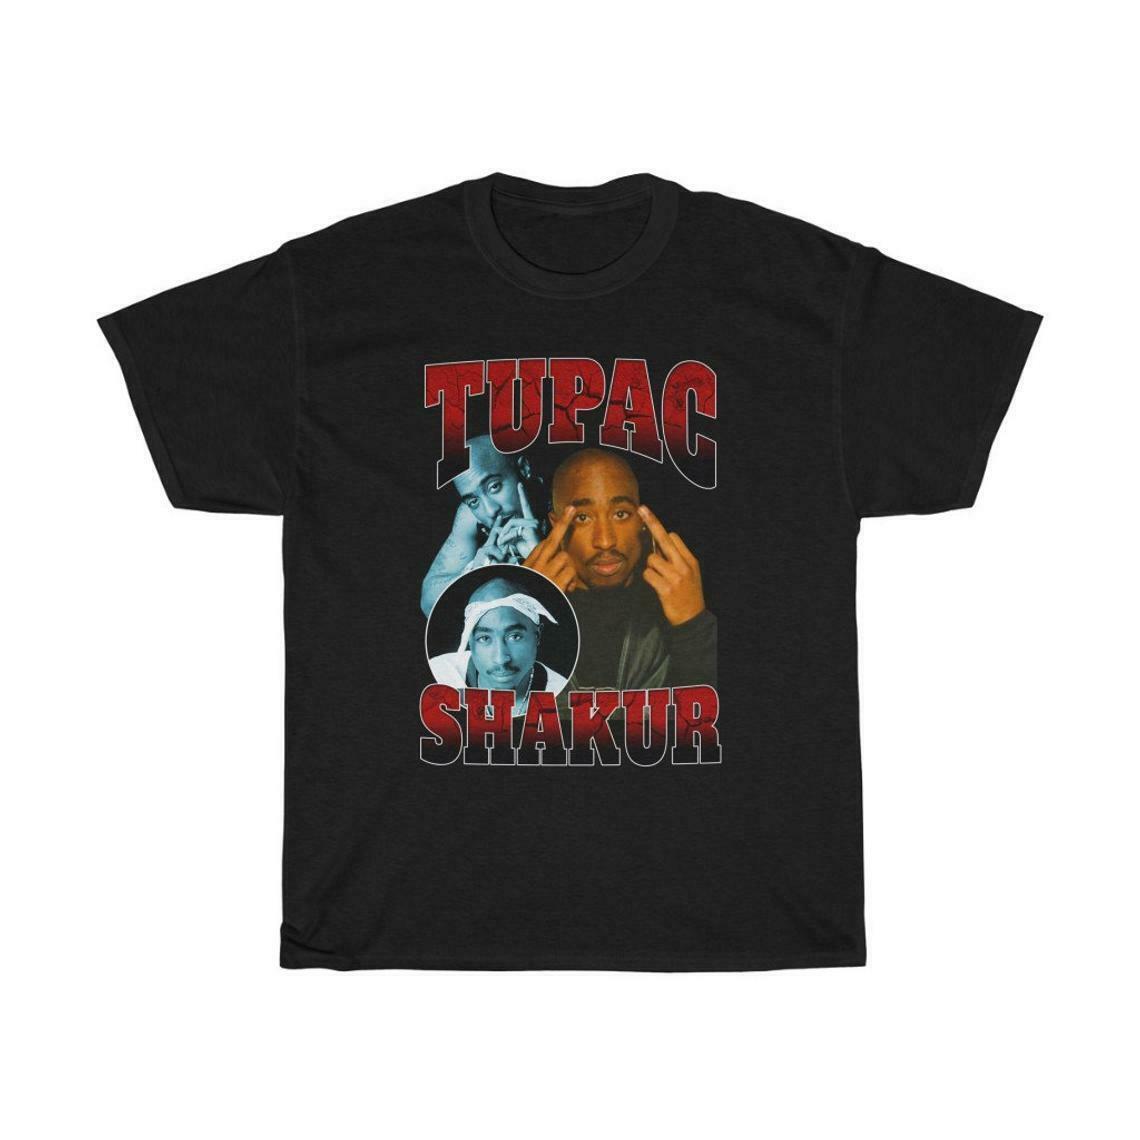 Tupac all eyez em mim concerto manga curta preto unisex s 234xl t camisa l726